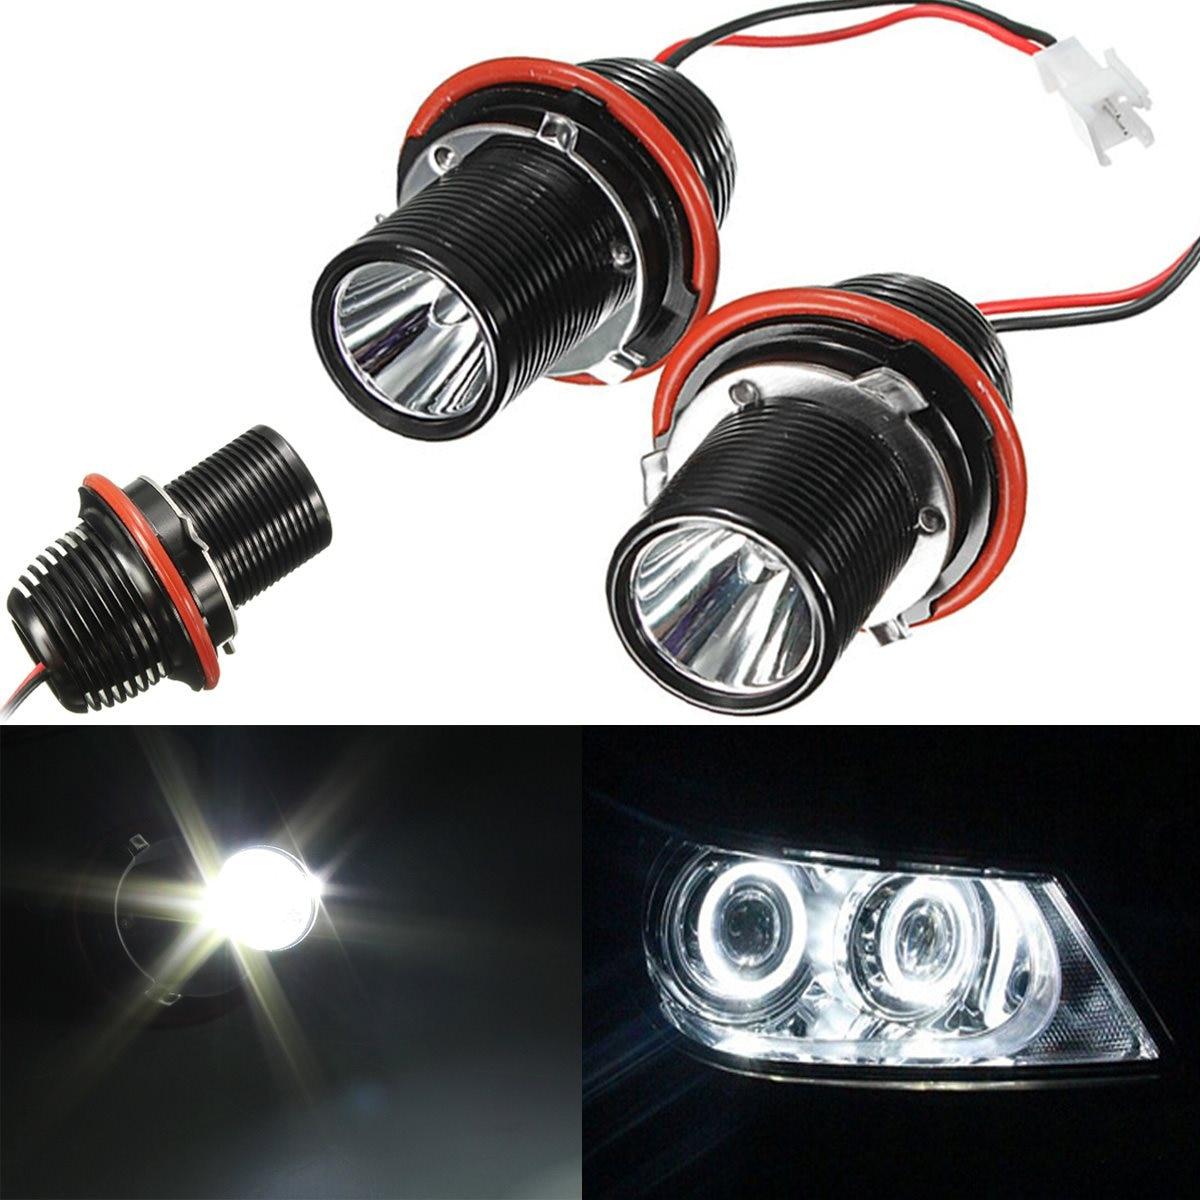 Подробнее о Audew 2PCS 10W LED MARKER ANGEL EYE HALO RING LIGHT BULB FOR BMW E39 E53 E60 E63 E64 E66 E83 7w e39 led marker led angel eye bulb for bmw e39 e53 e60 e63 e64 e65 e66 e67 led headlight halo ring bulb led angel eyes